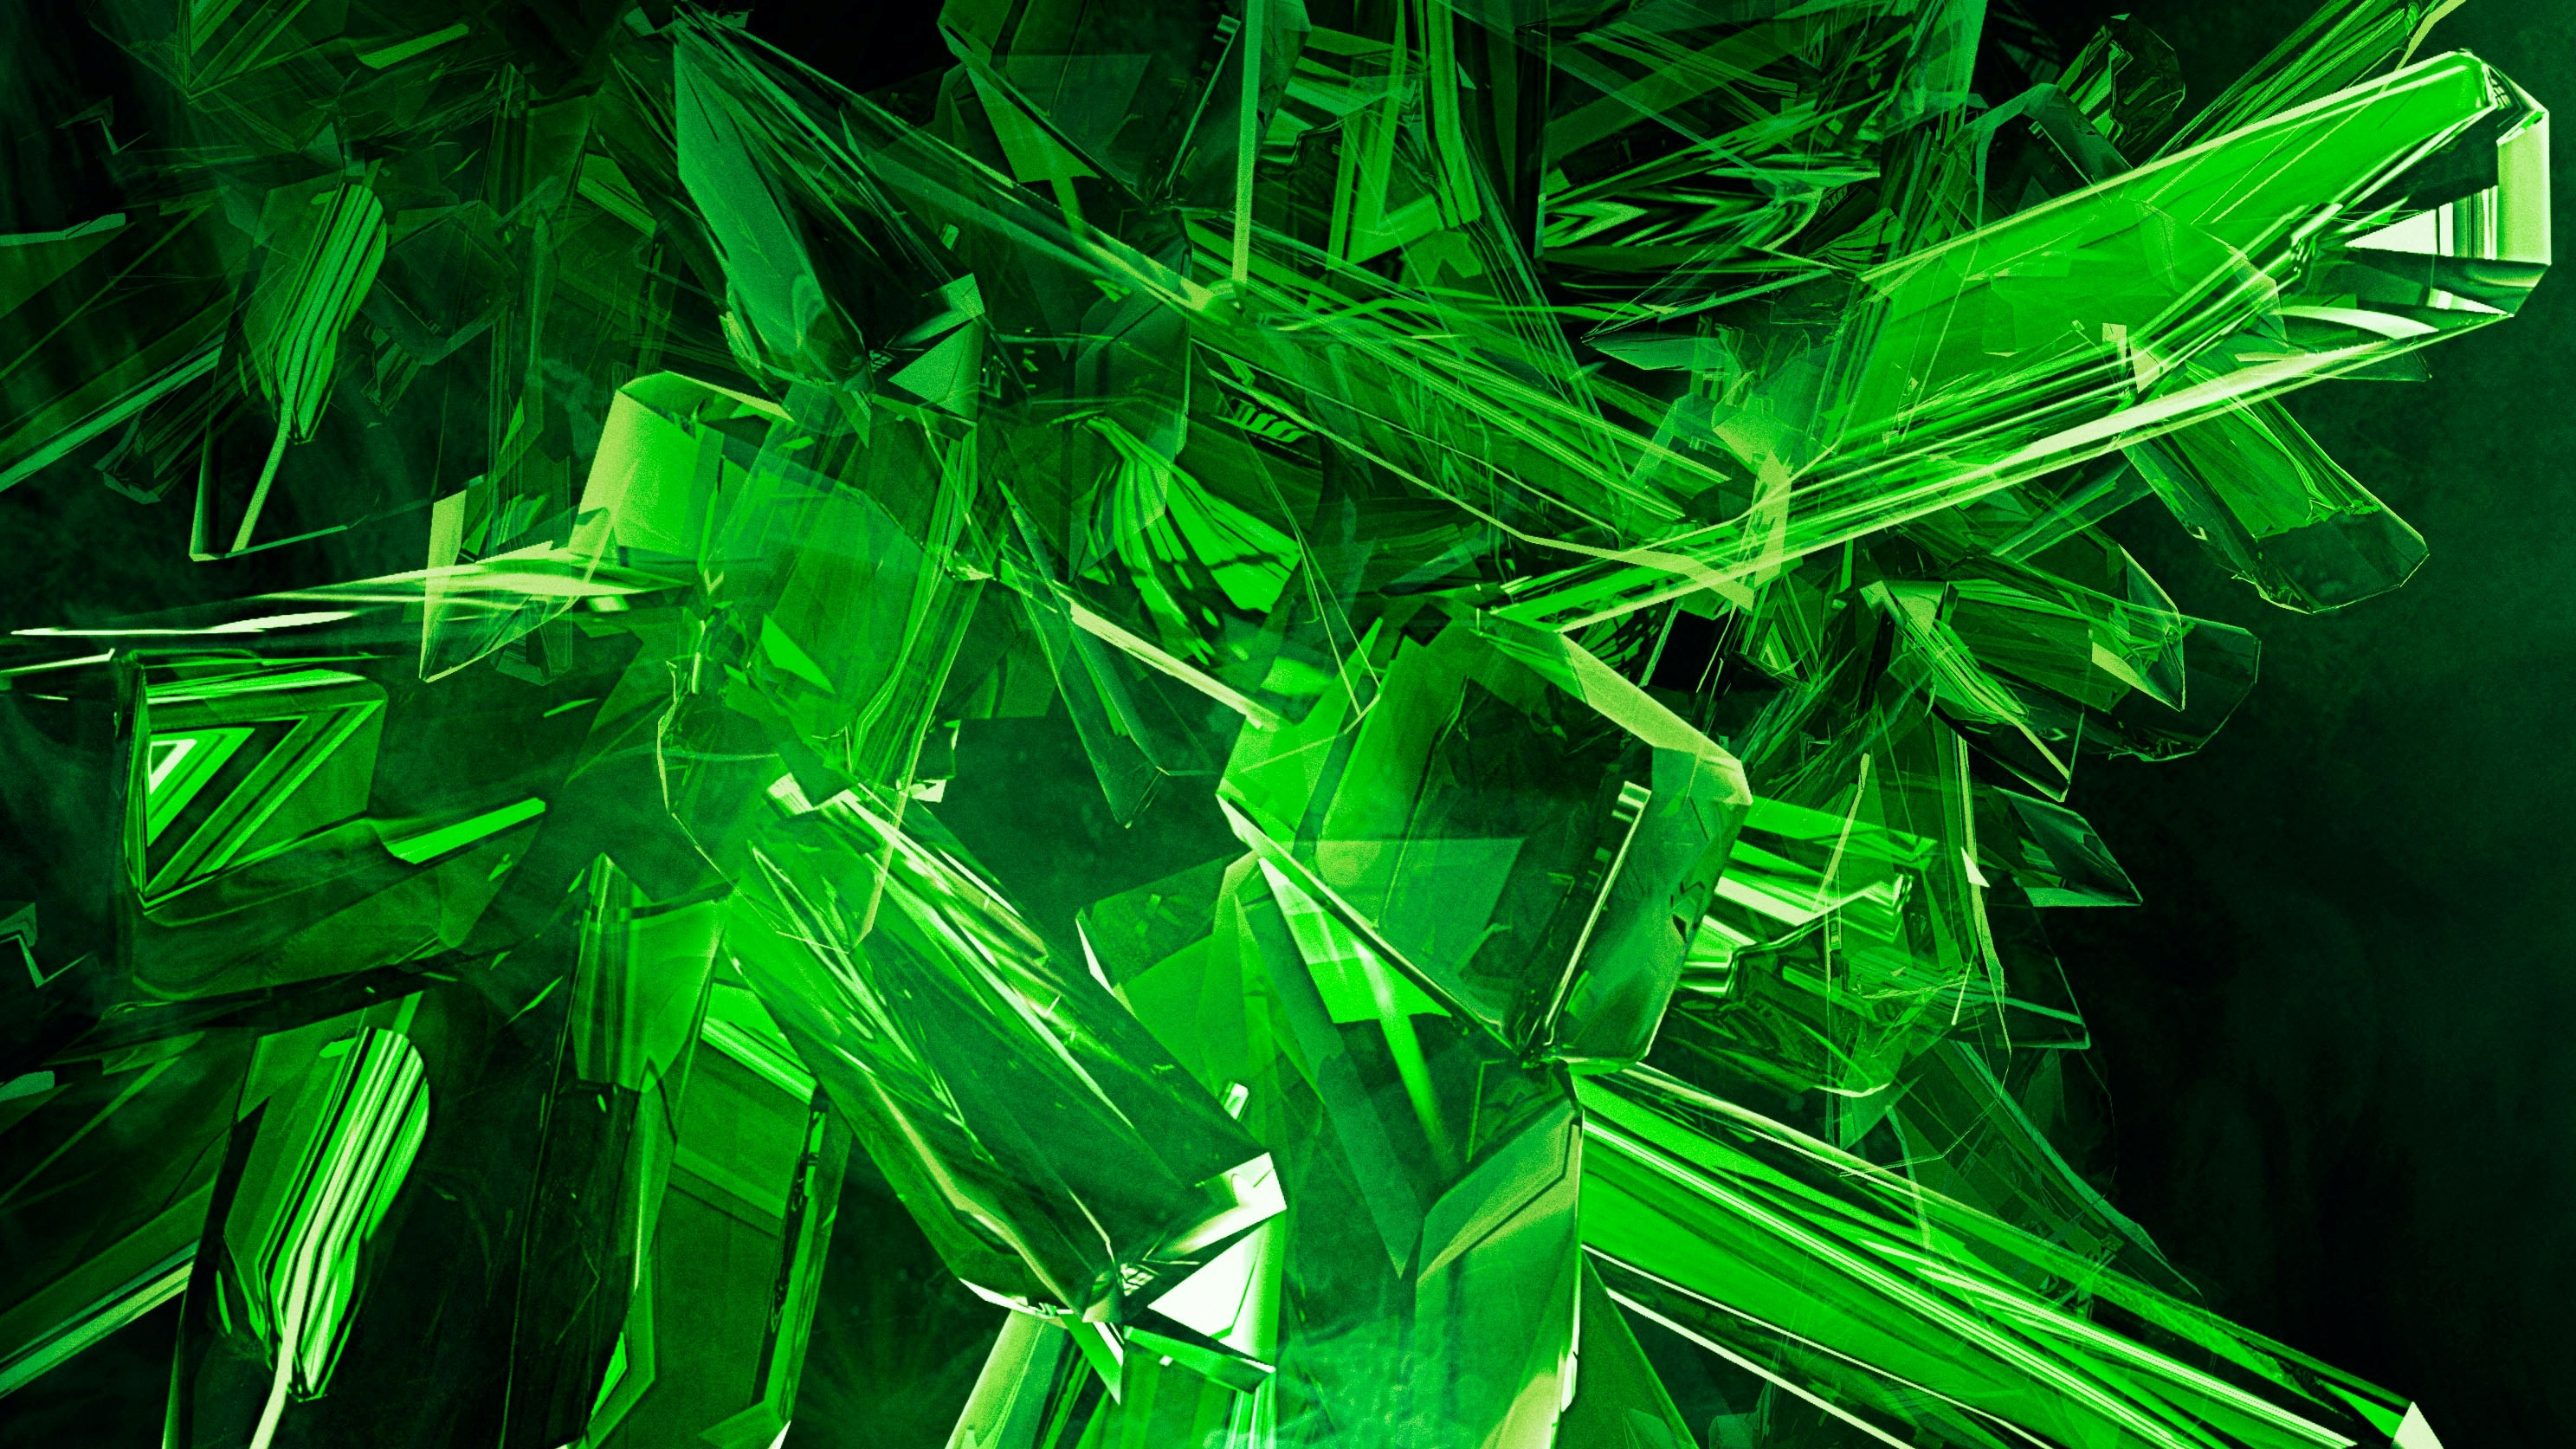 cool desktop hd wallpaper 14591 Image Green View Abstract Gems Cool HD 2975x1673